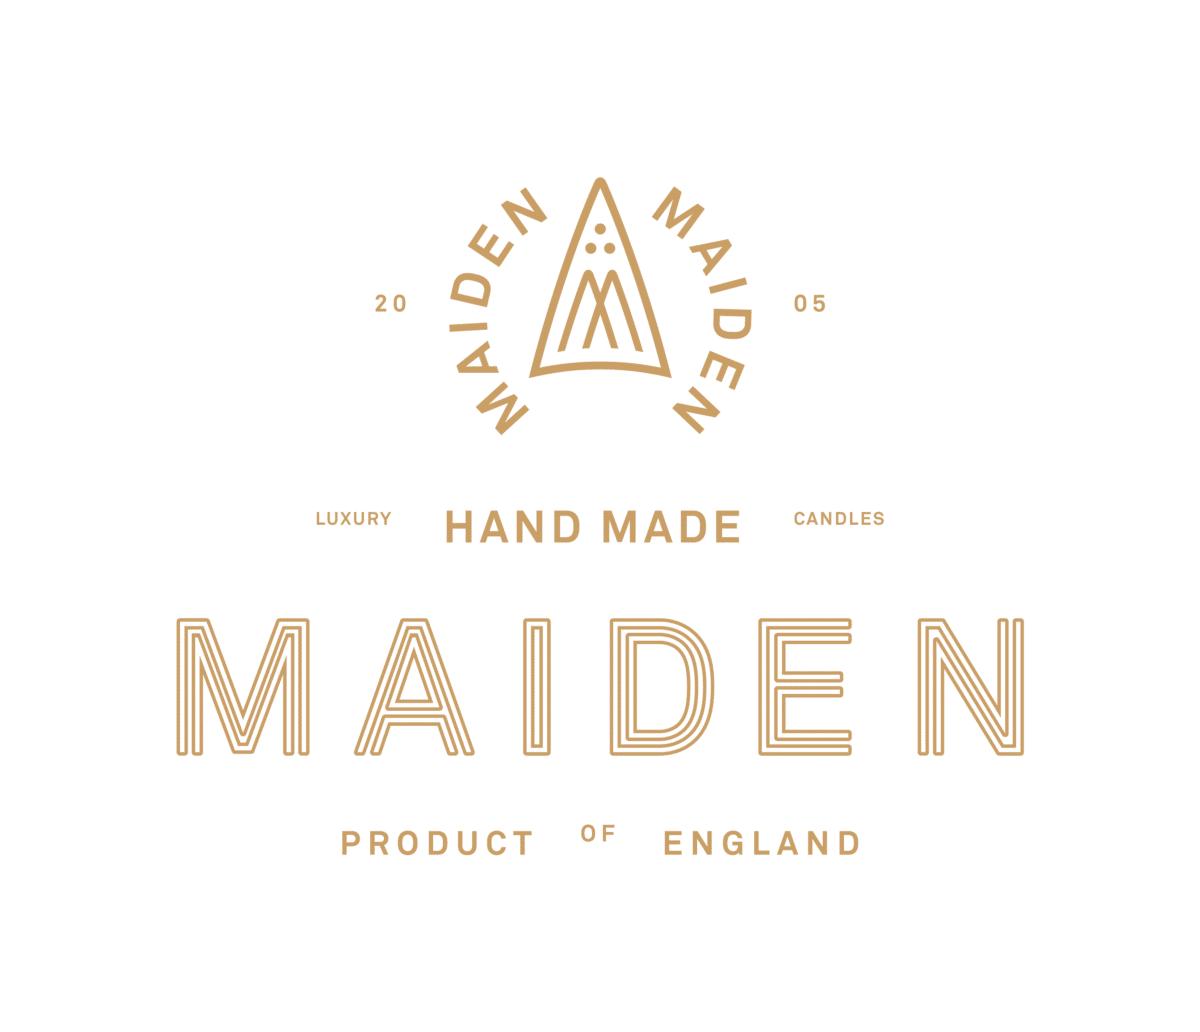 New Work — Coming Soon.MAIDEN / BRANDING.#logo #Brand #Branding #Design #Graphicdesign #Luxury #pattern #packagingdesign #packaging #British #NewRelease #Style #contemporary #handmade #london #dorset #graphicdesigner #graphicdesign #designagency #brandingagency #experience #candles #luxury #luxurydesign #luxurylifestyle